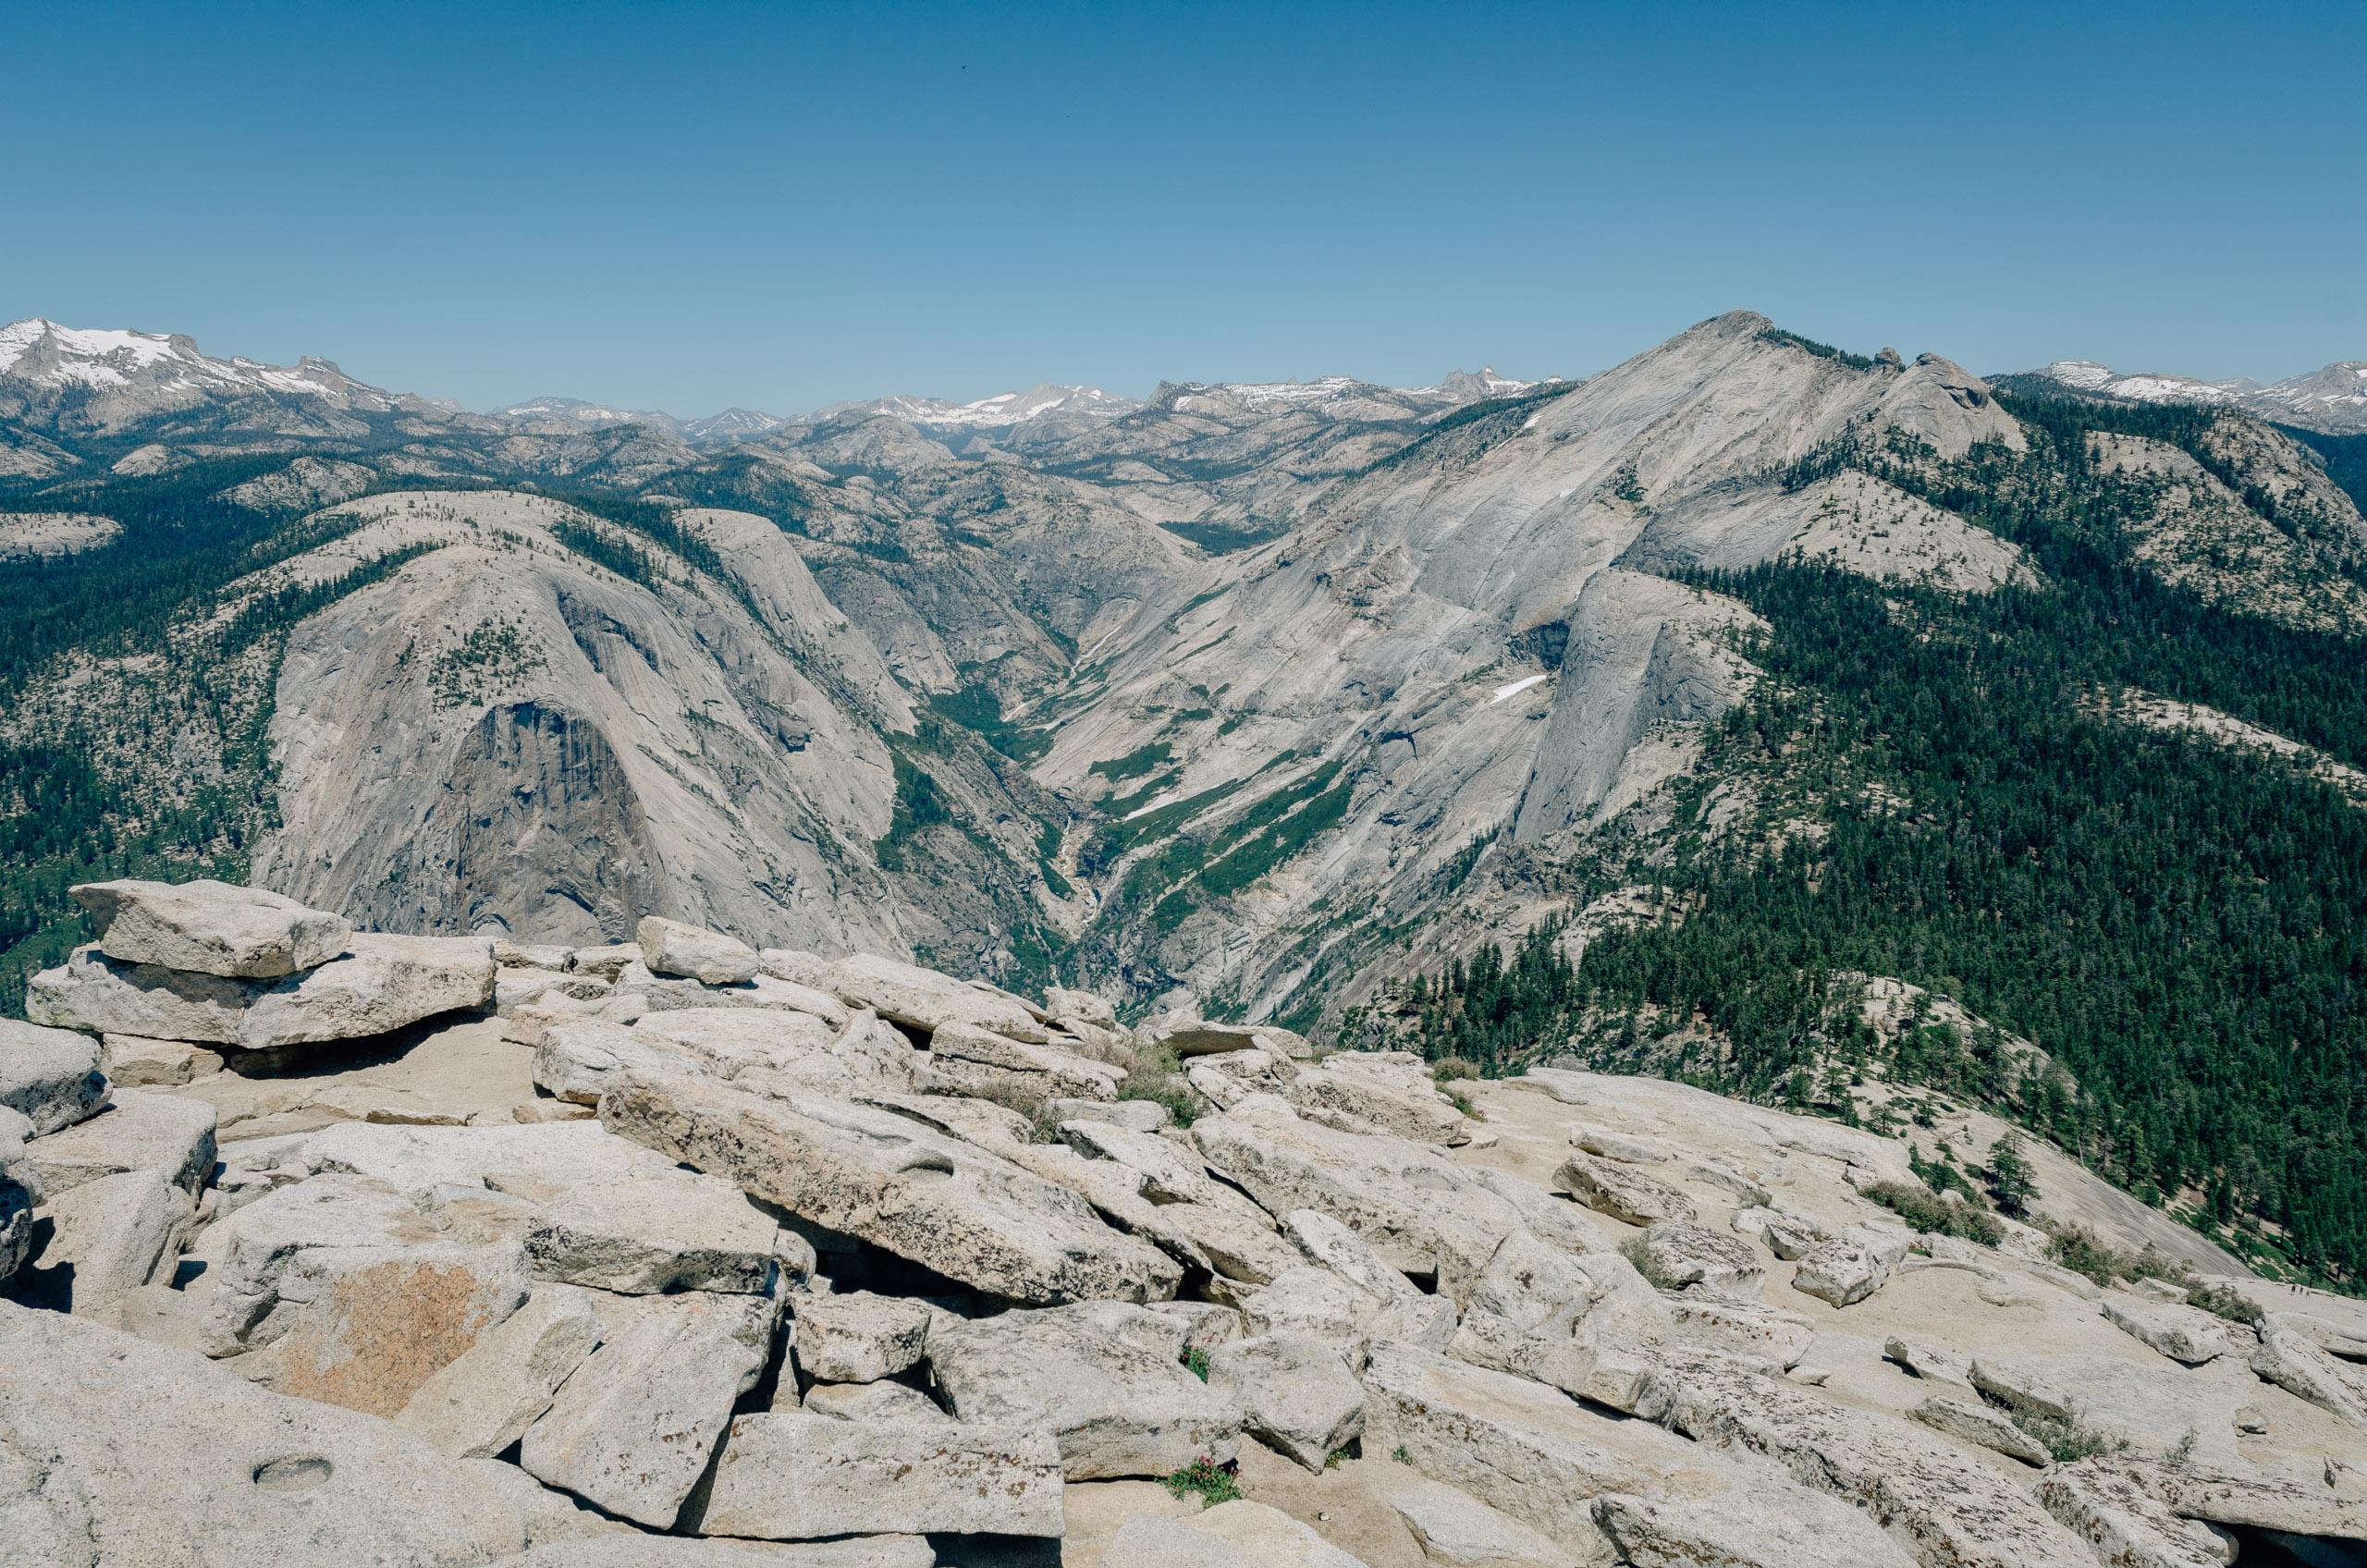 Yosemite National Park - 2011-0709-KPK_8548